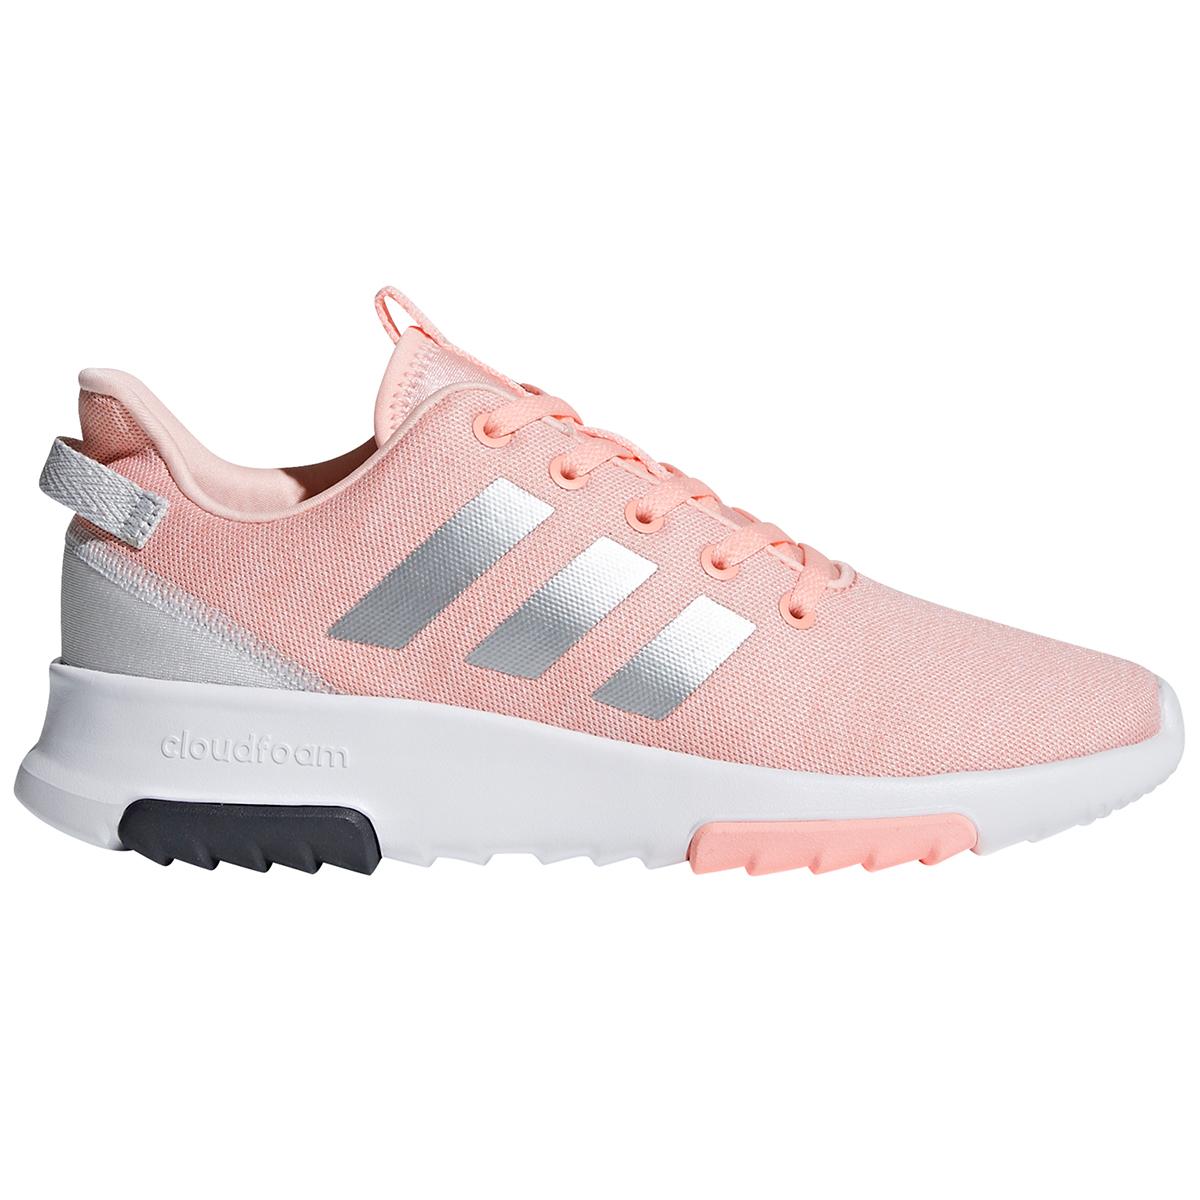 "Adidas Girls"" Cloudfoam Racer Tr Running Shoes - Orange, 5"